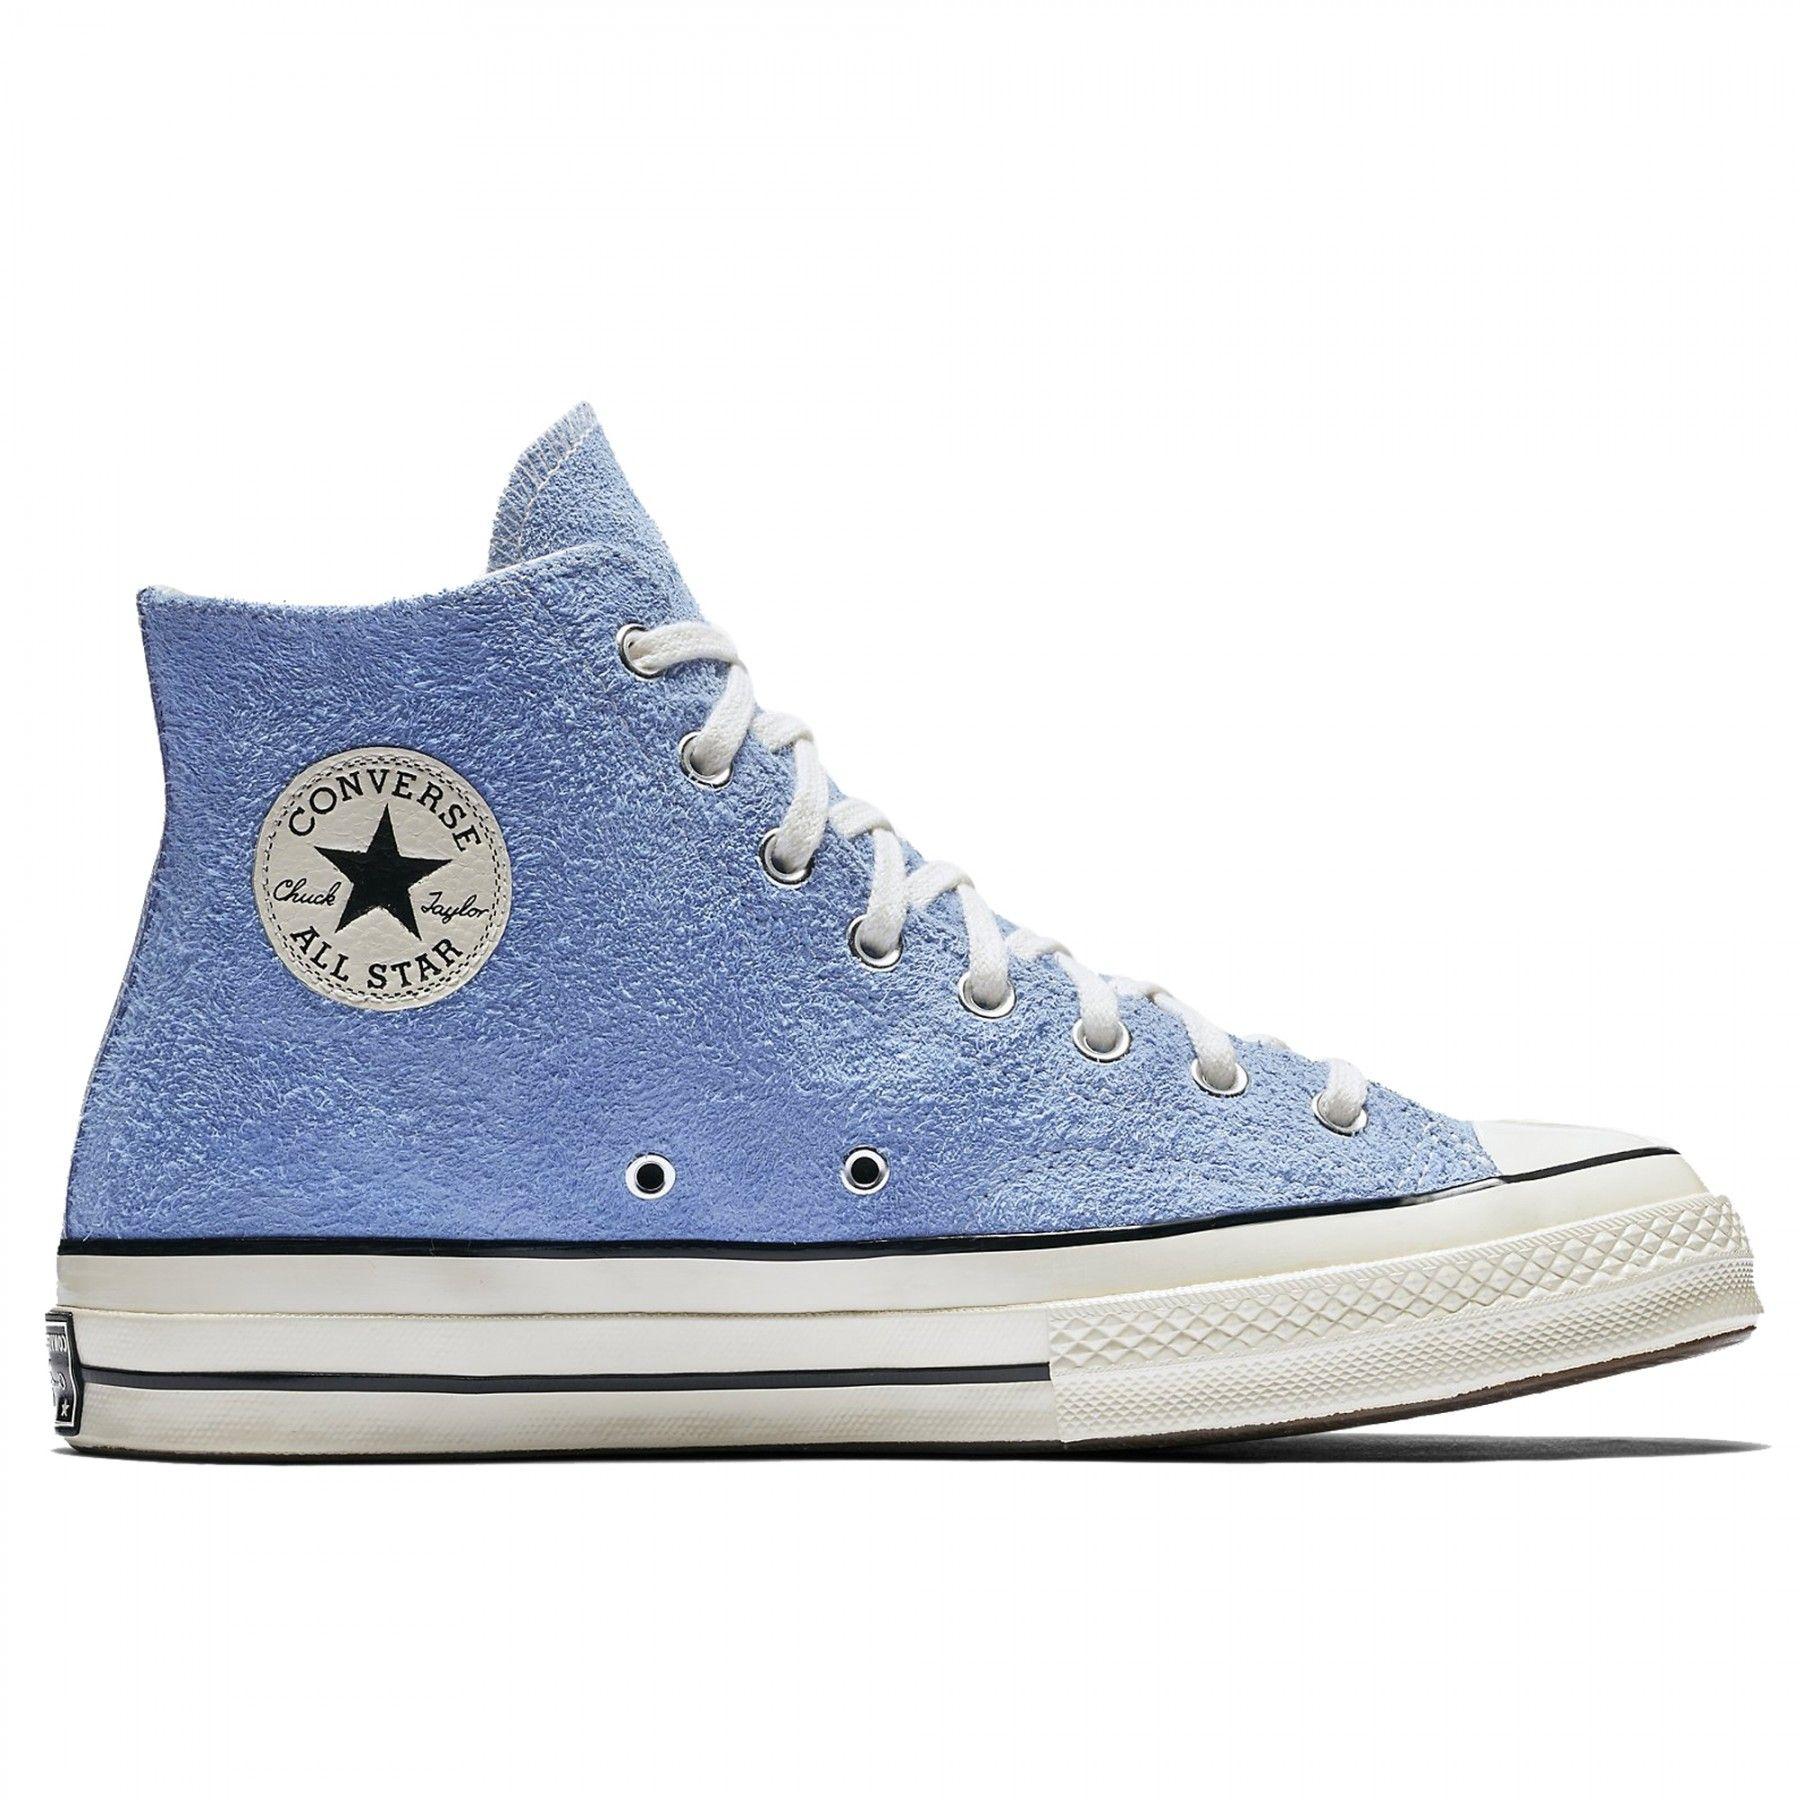 2e4991bcdbcd Converse Chuck Taylor All Star 70 HI Vintage Suede (Blue)